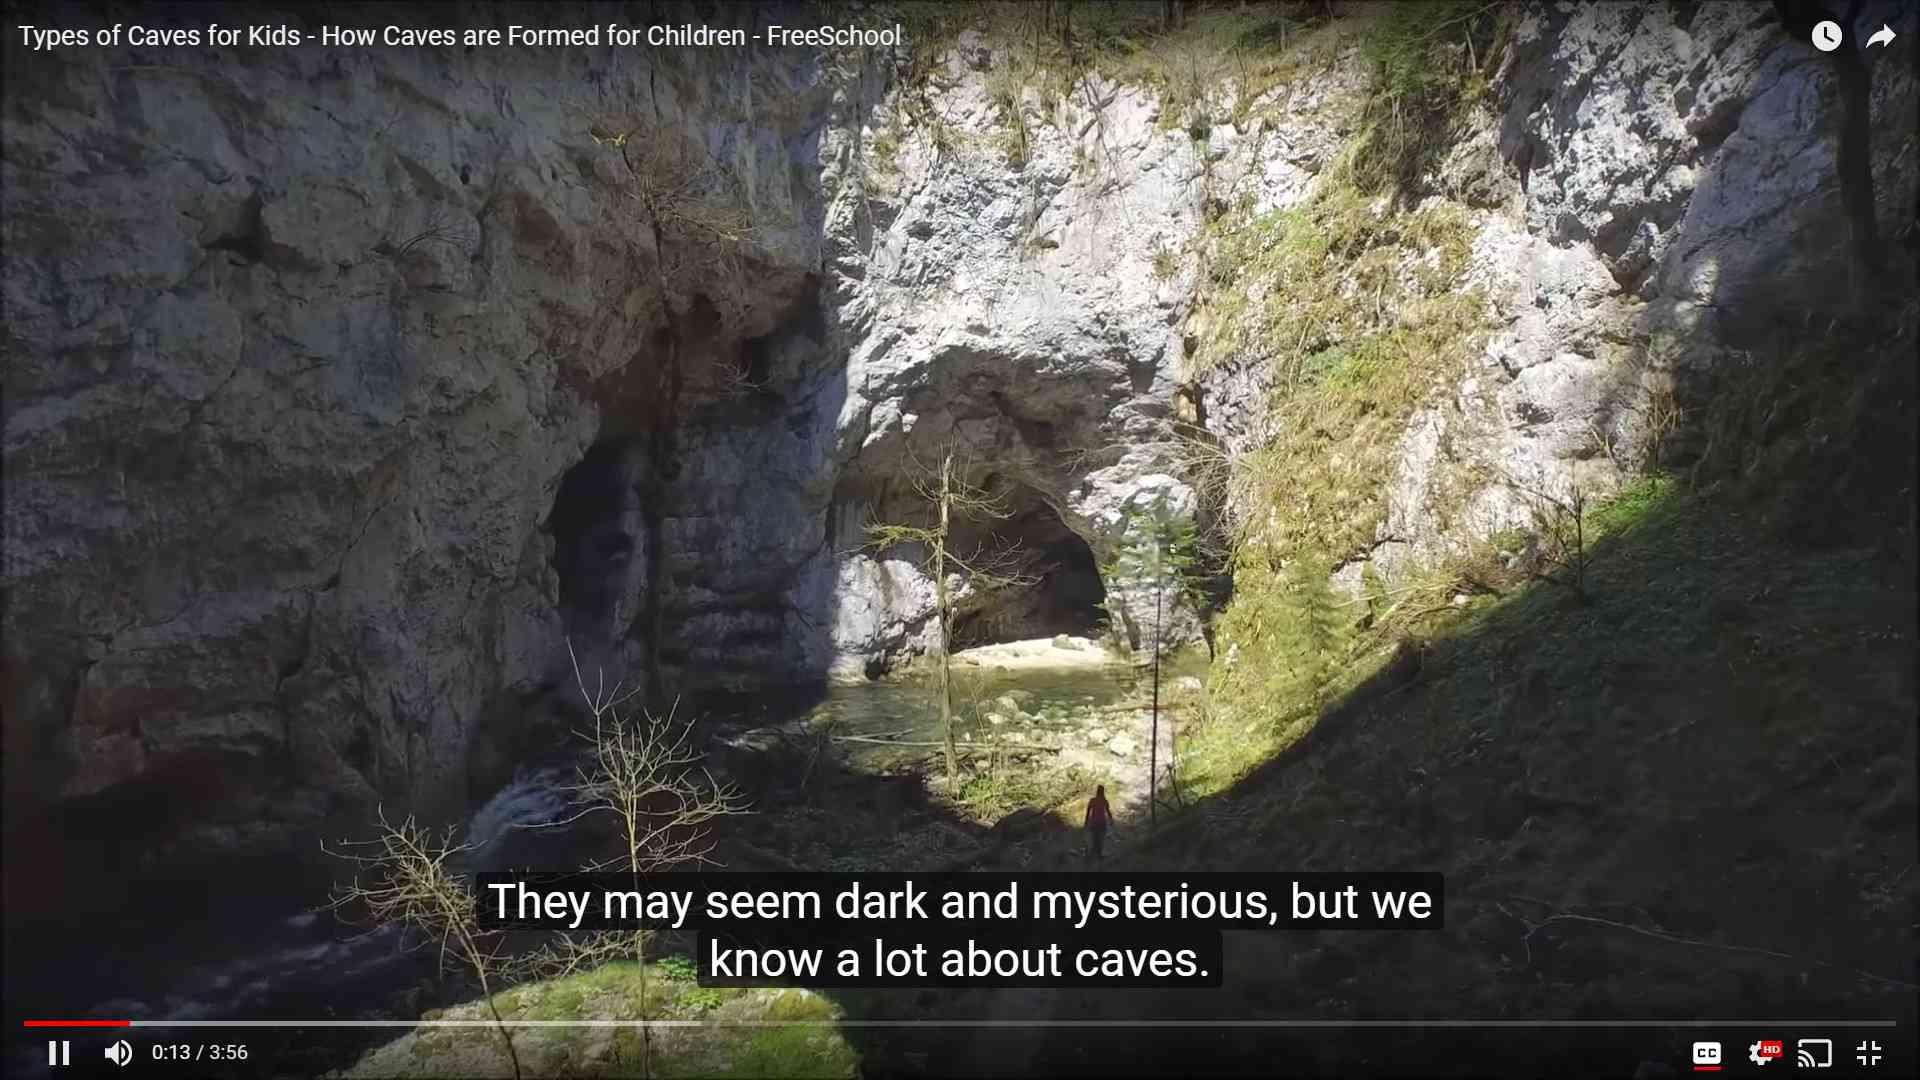 Free School video screenshot depicting a cave